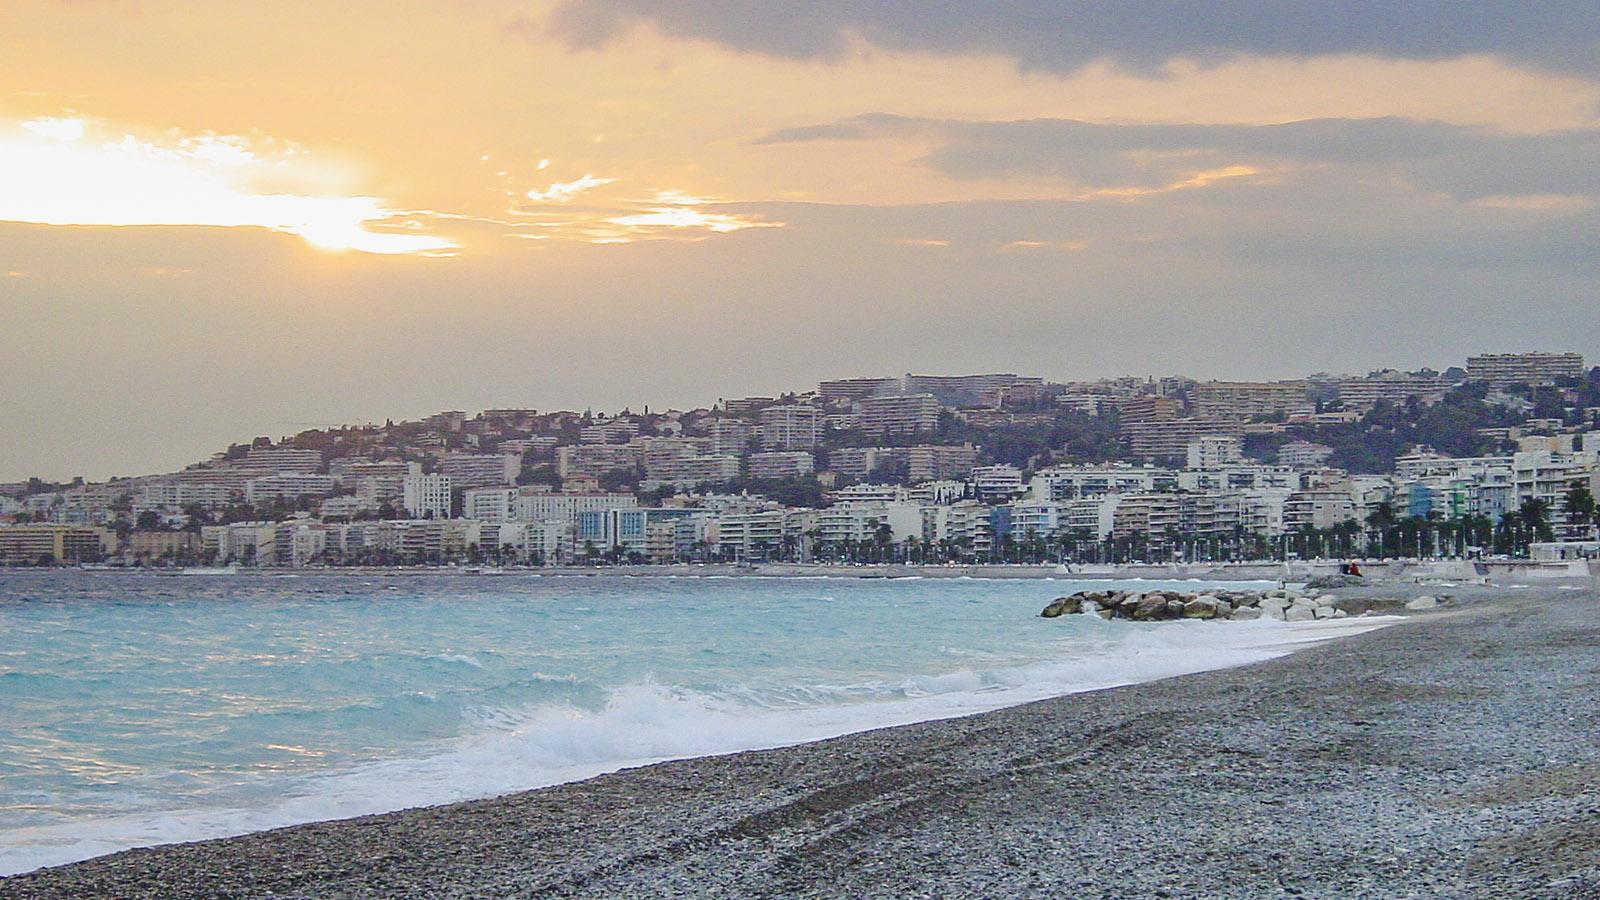 Abenddämmerung am Strand, Blick gen Westen. Foto: Hilke Maunder